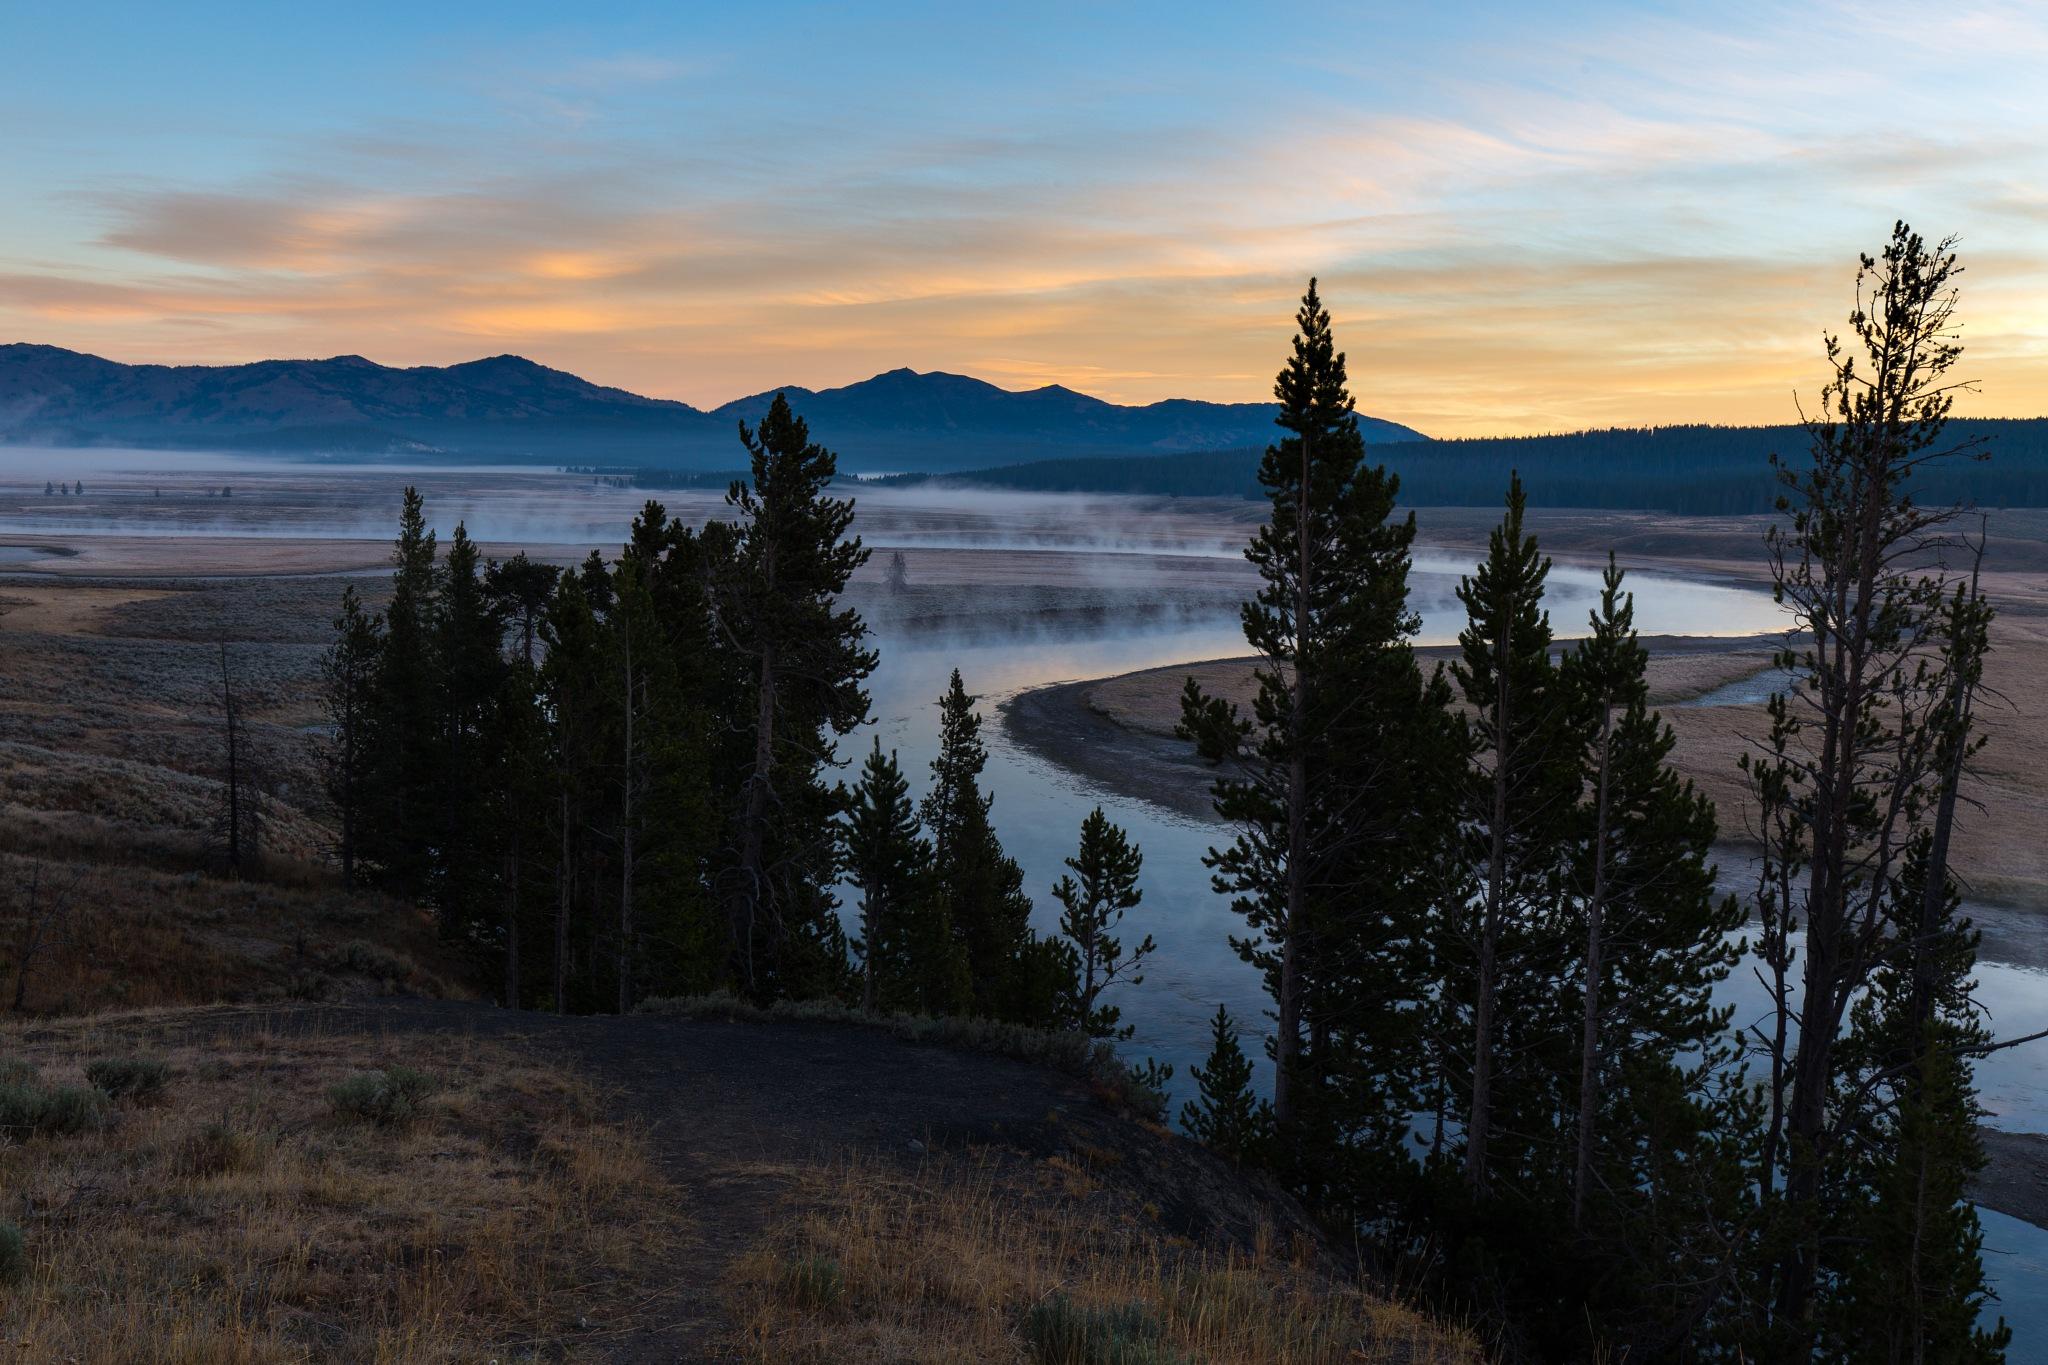 Sunrise over Hayden Valley by timacker